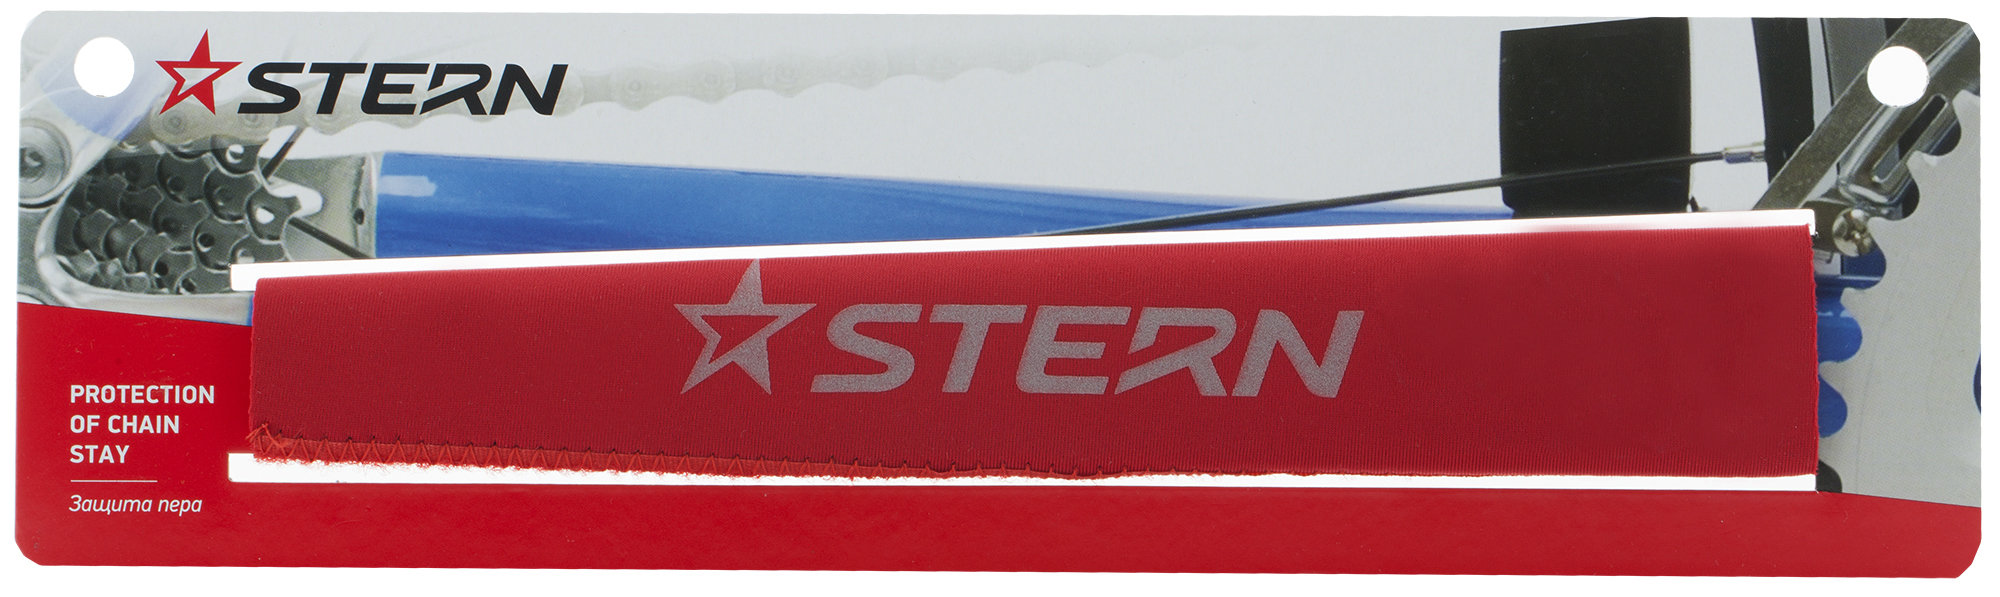 Неопреновая защита перьев Stern